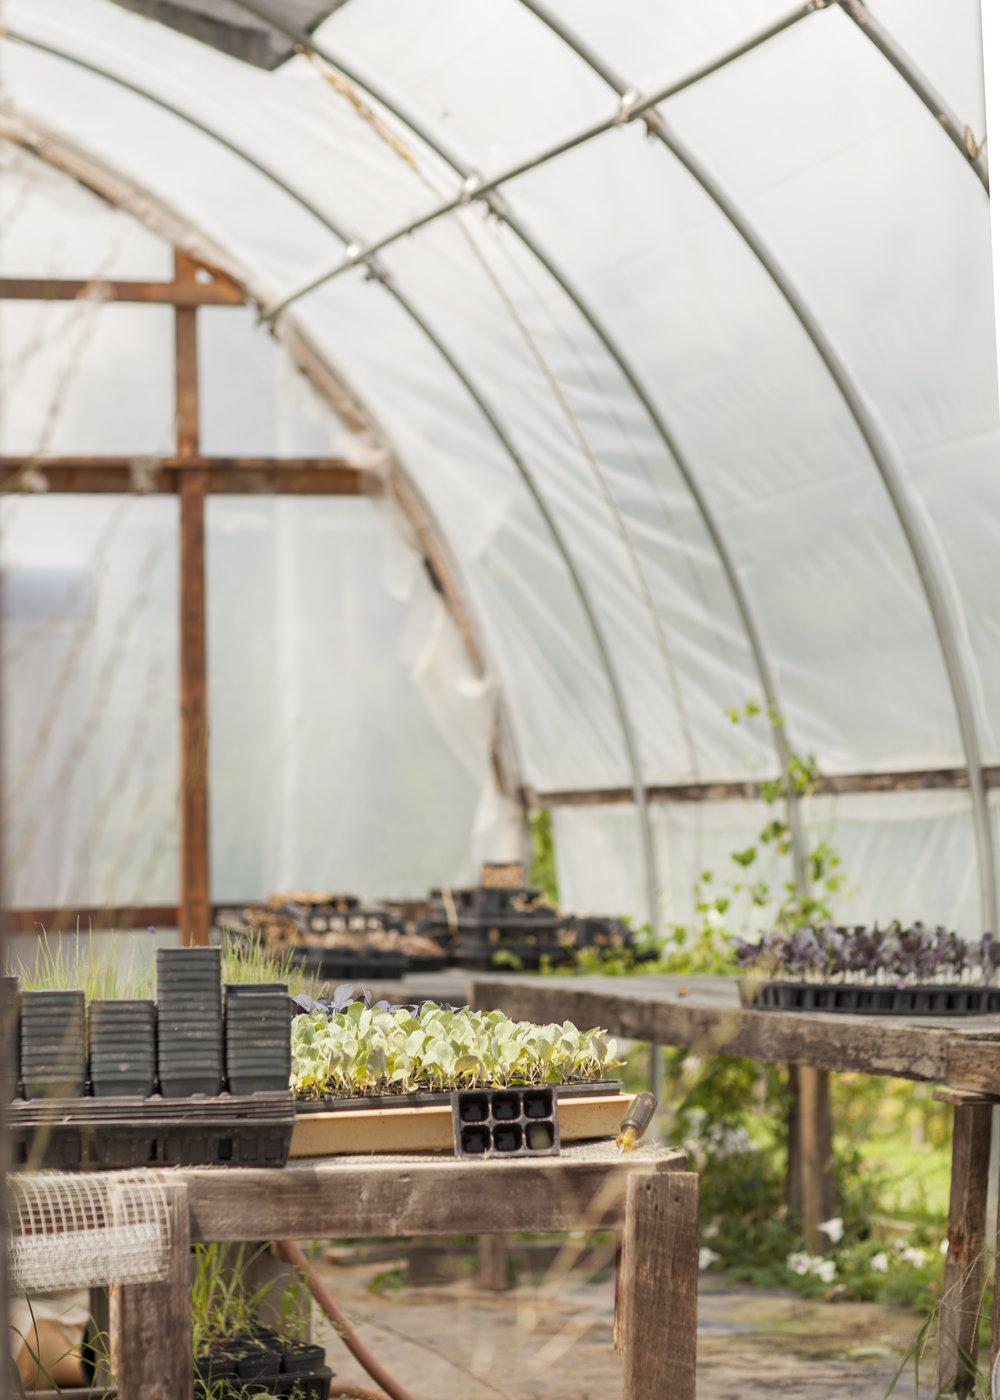 8 Greenhouse2.jpg